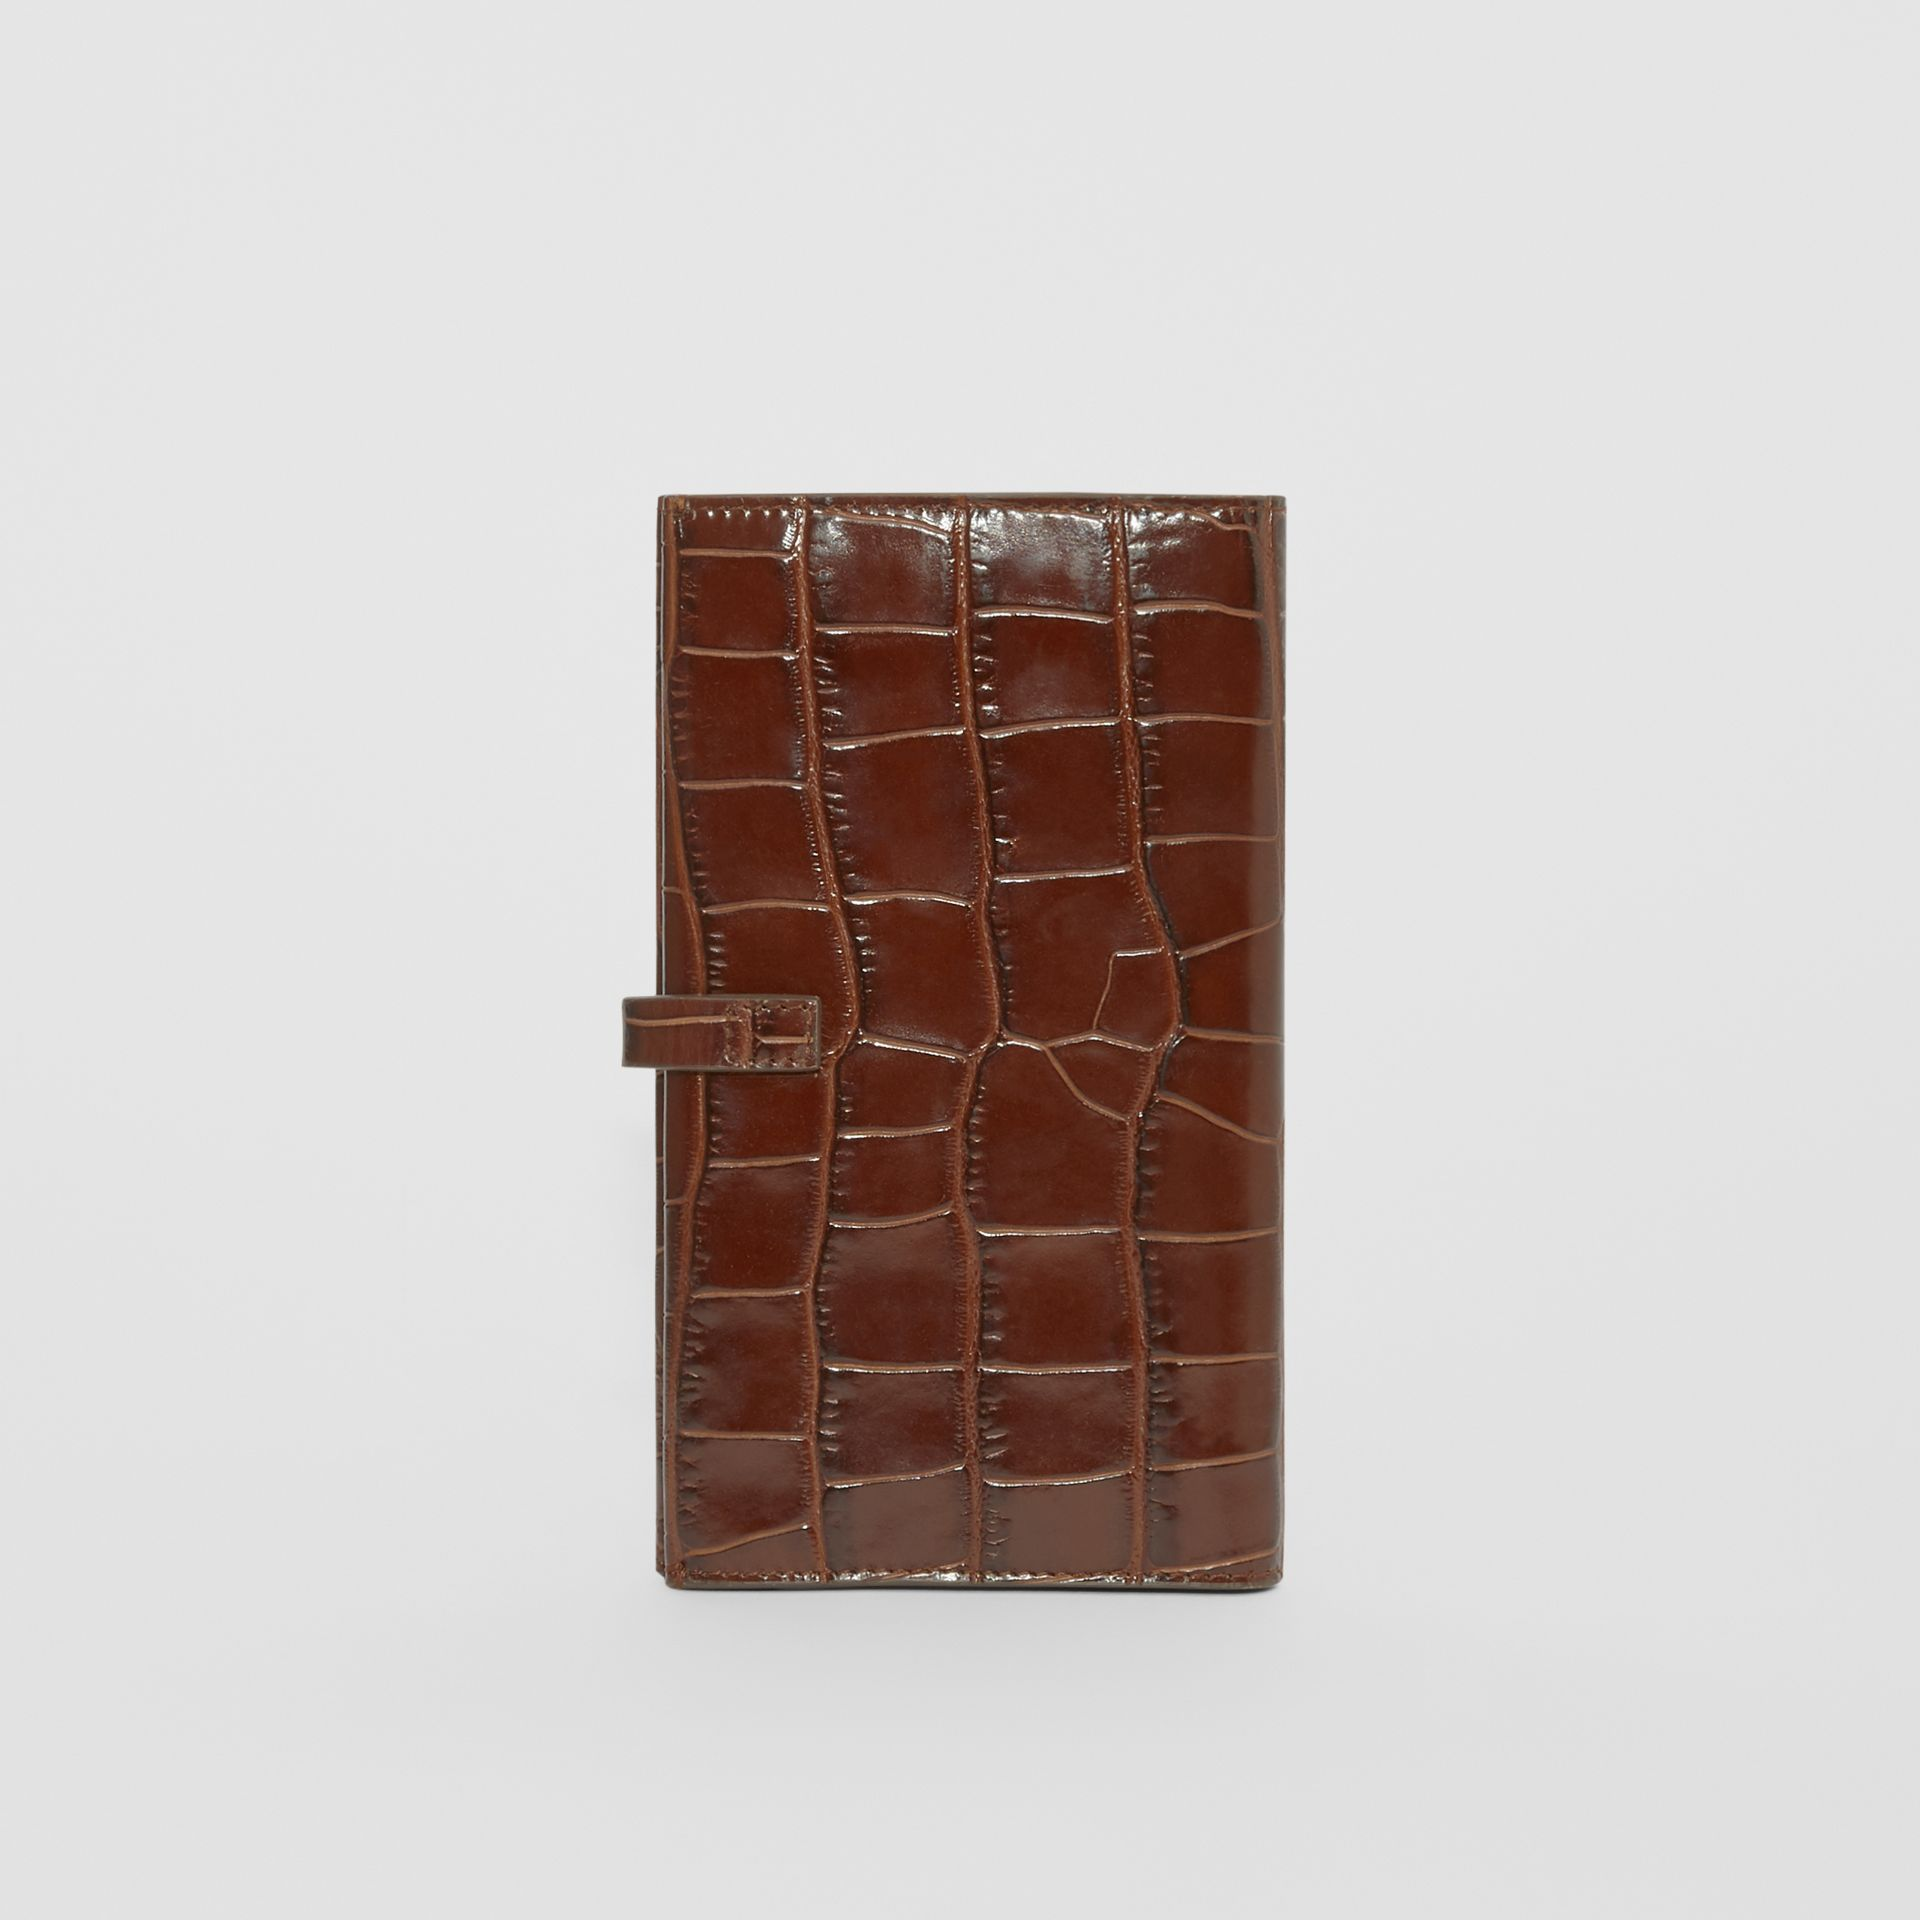 Monogram Motif Embossed Leather Folding Wallet in Tan - Women | Burberry - gallery image 5